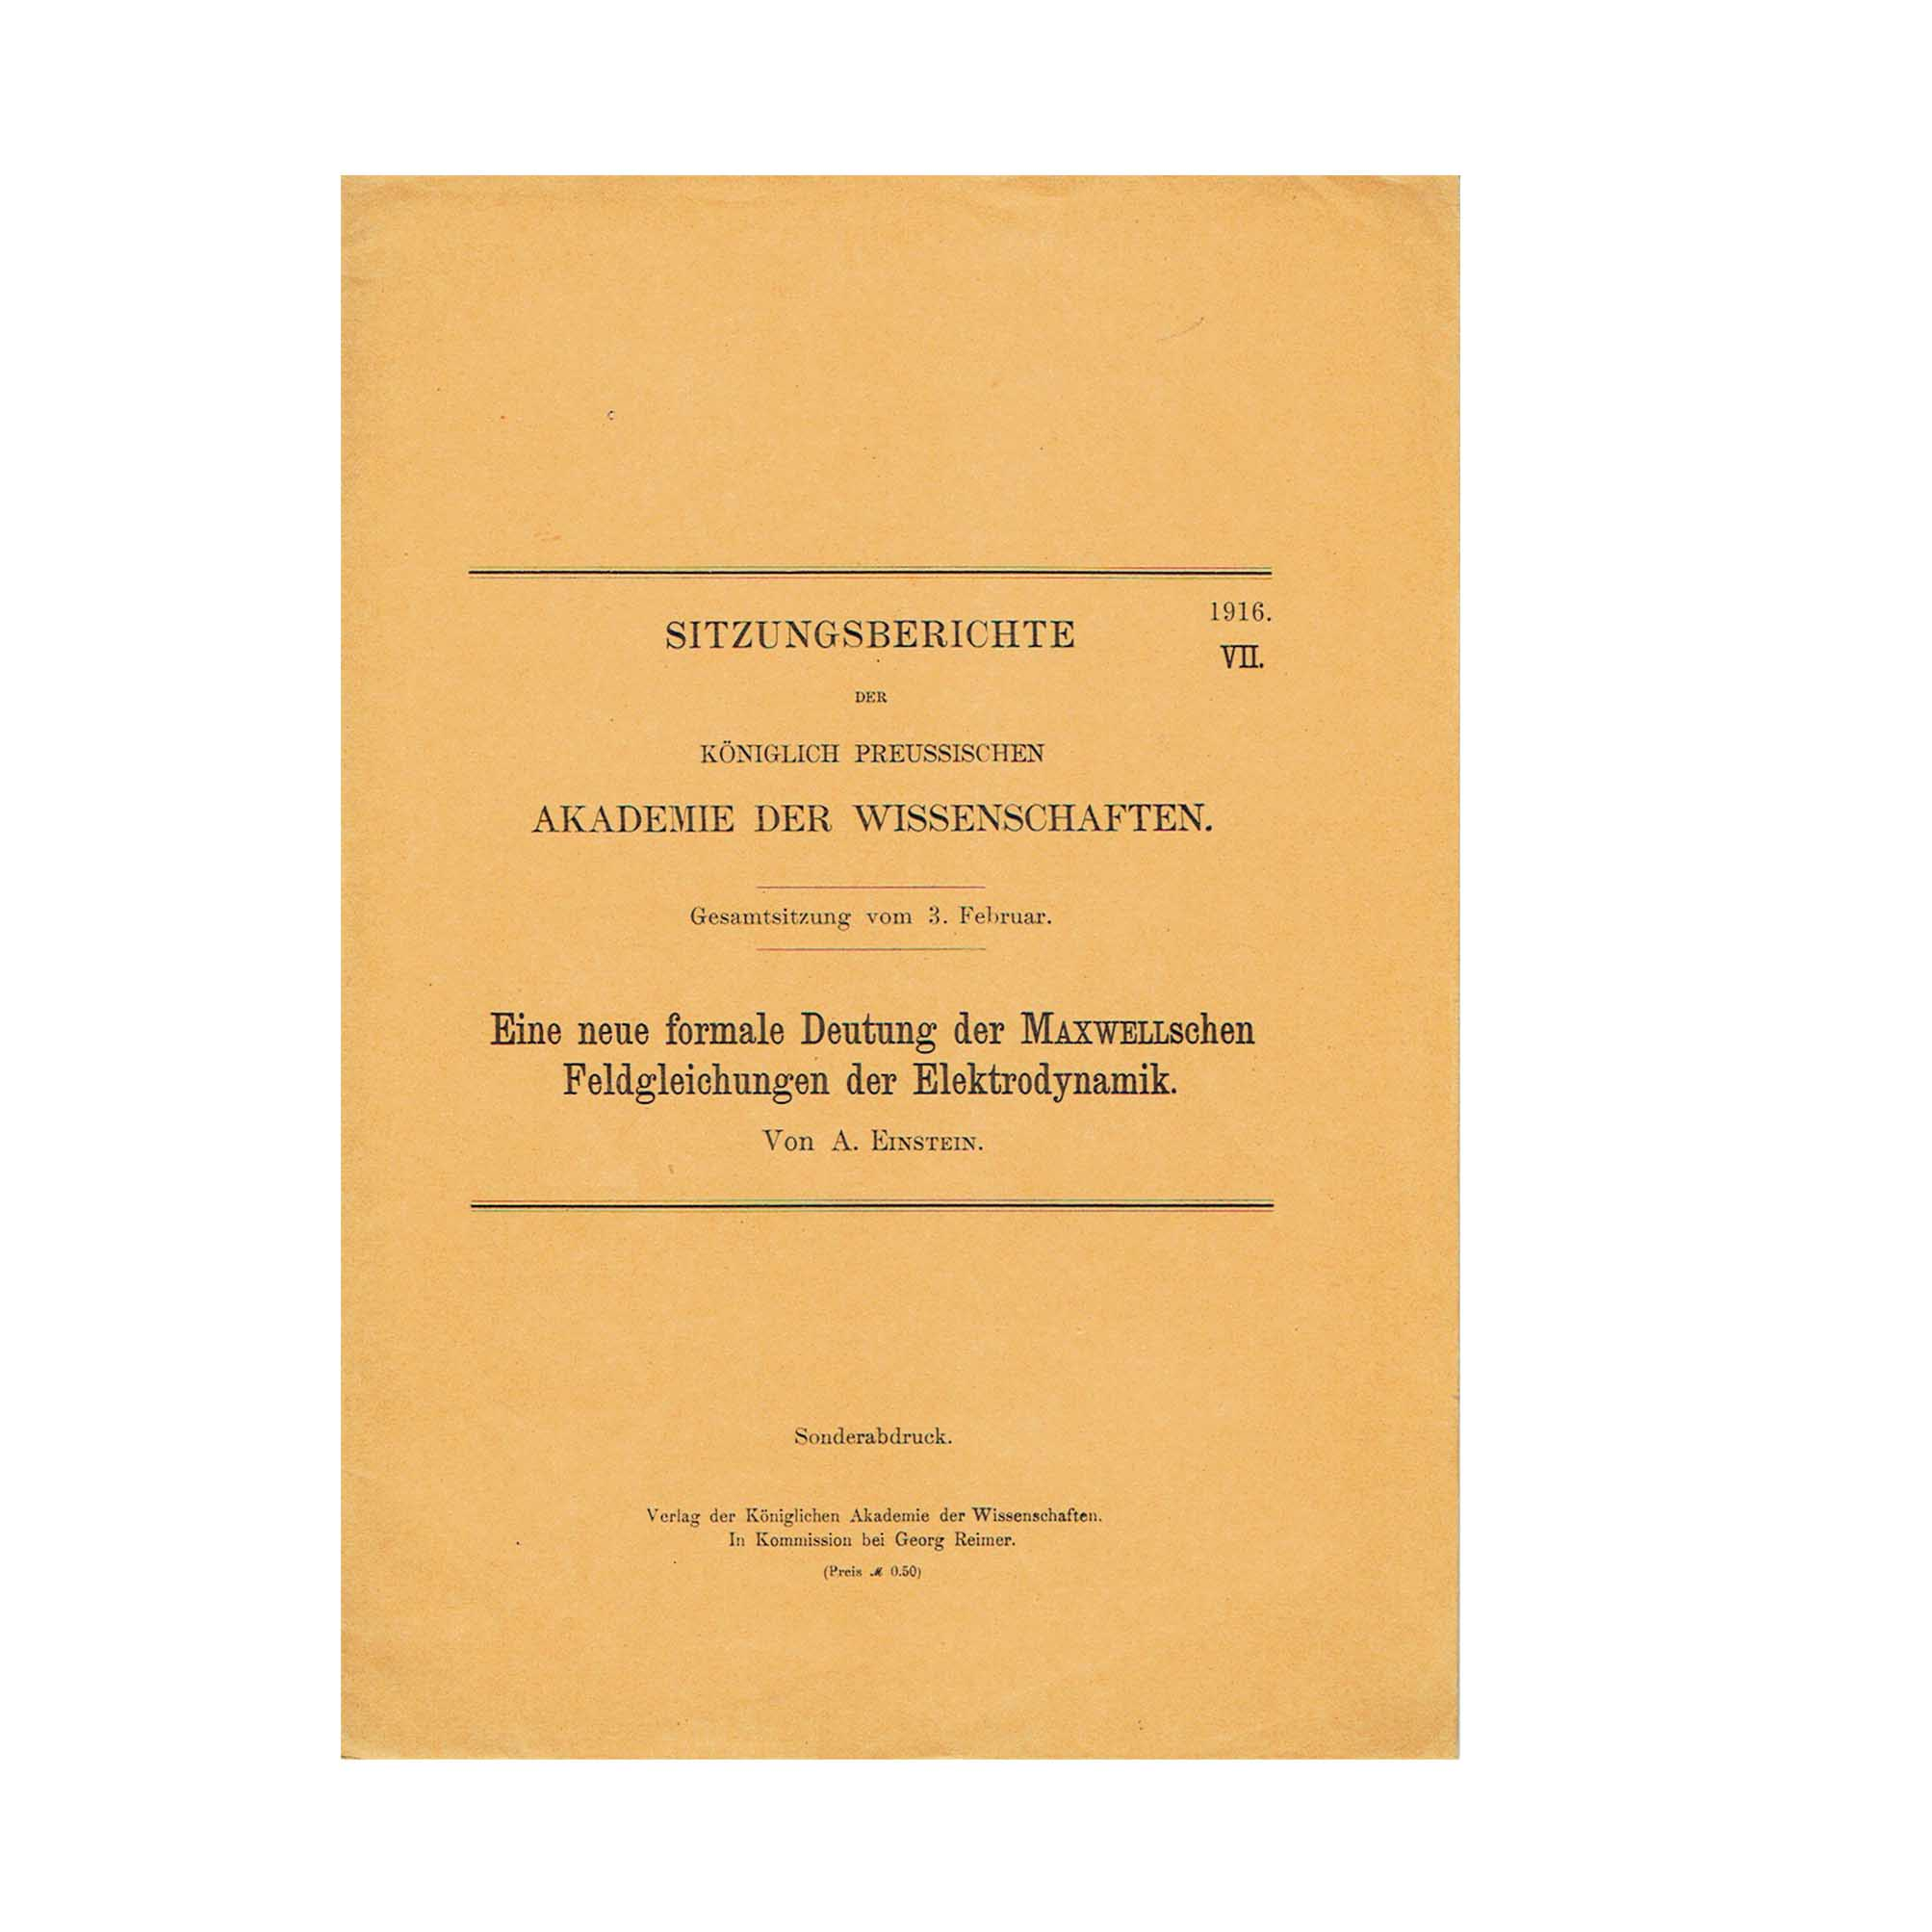 5713-Einstein-Maxwell-Akademie-VII-1916-free-SA-Cover-recto-N.jpeg